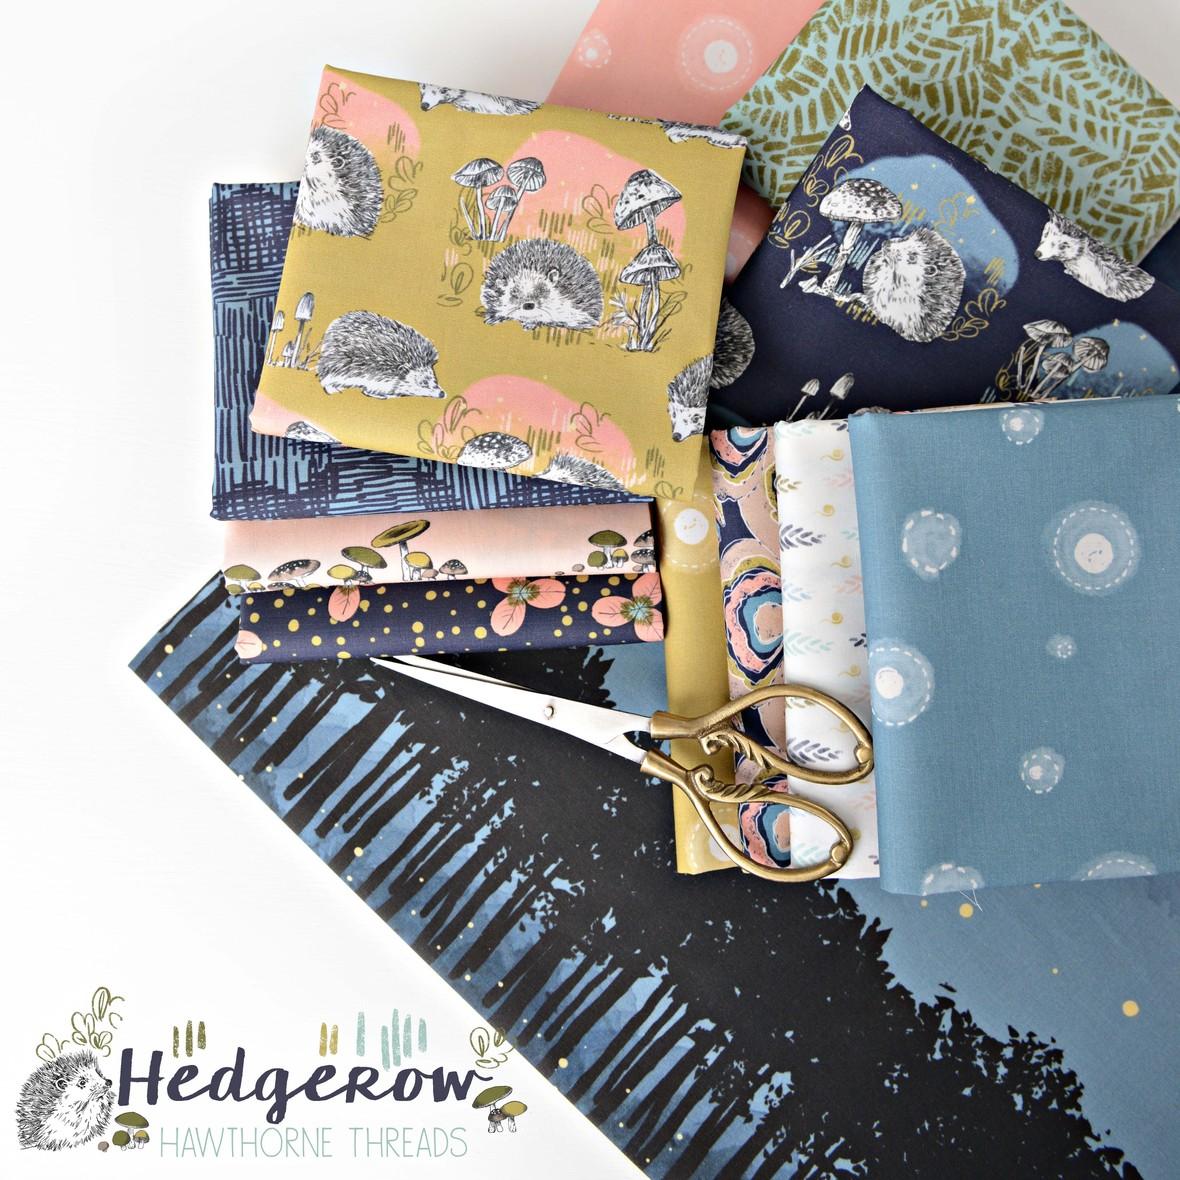 Hedgerow Fabric by Hawthorne Threads